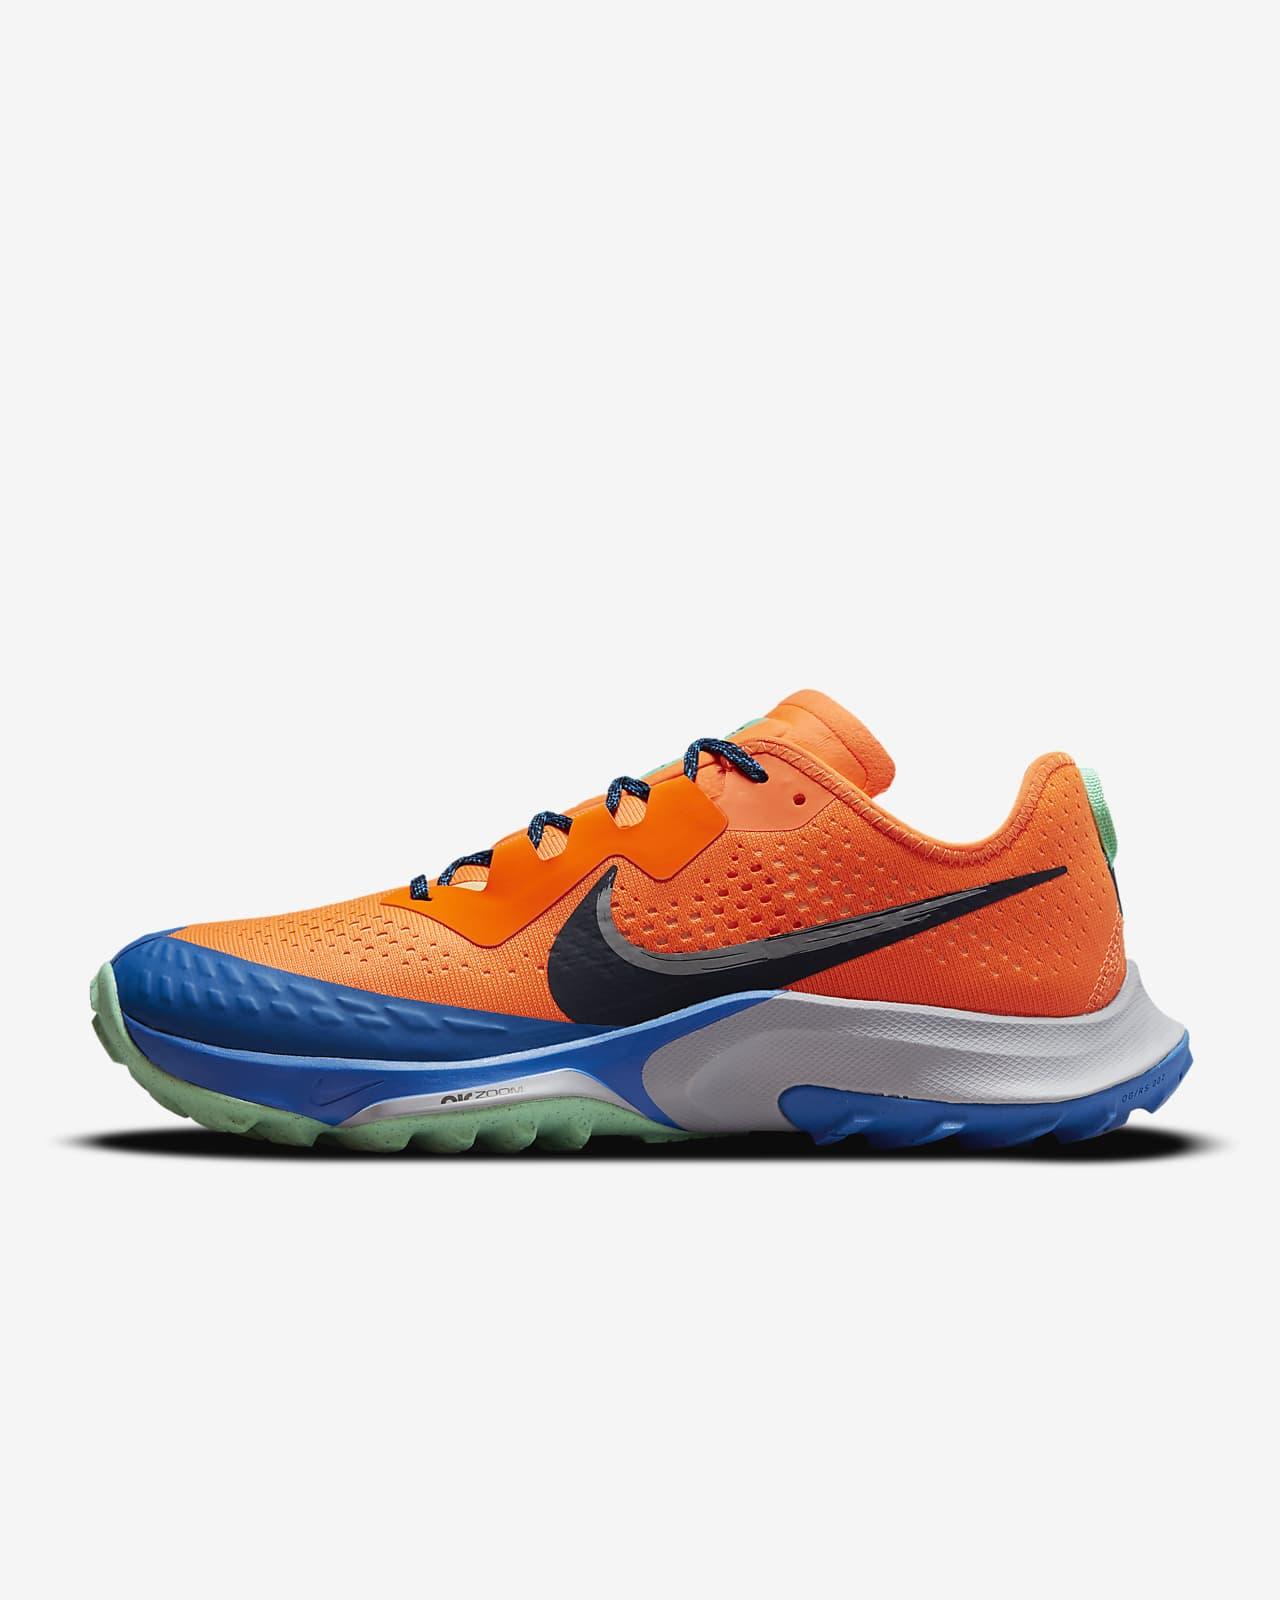 Nike Air Zoom Terra Kiger 7 Men's Trail Running Shoes